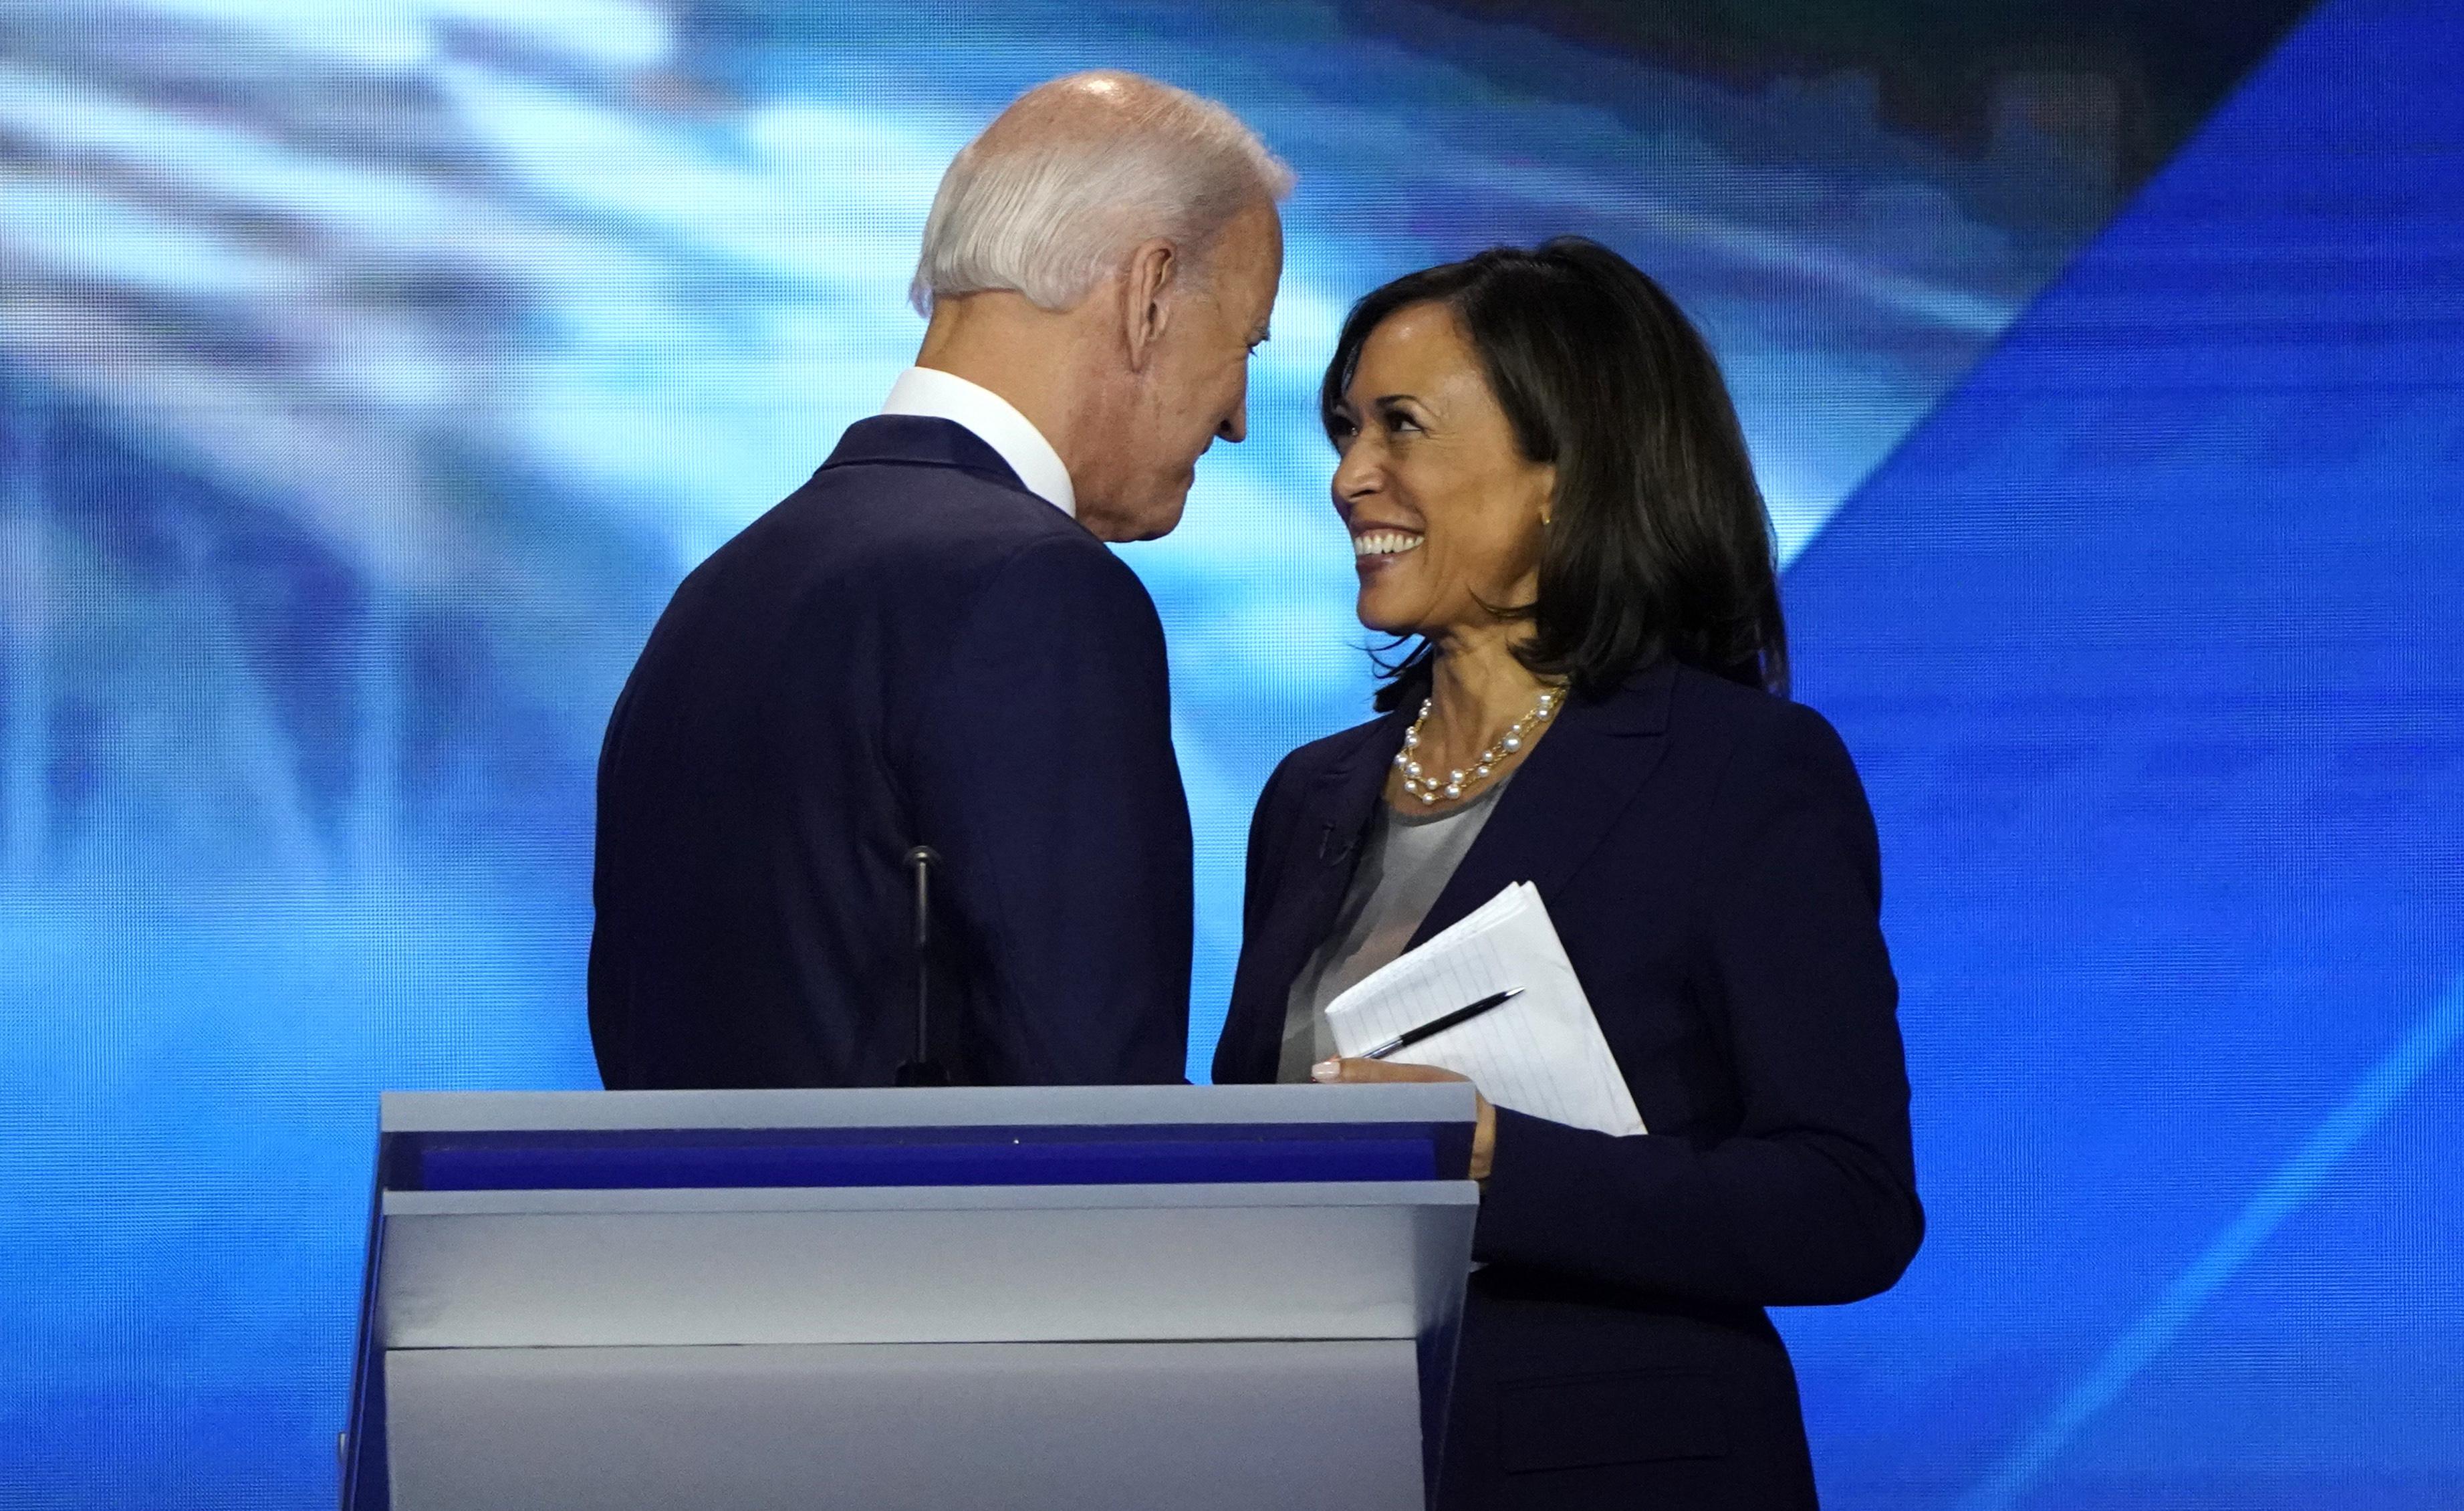 Former Vice President Joe Biden talks with Senator Kamala Harris after the conclusion of the 2020 Democratic U.S. presidential debate in Houston, Texas, U.S., September 12, 2019. REUTERS/Mike Blake